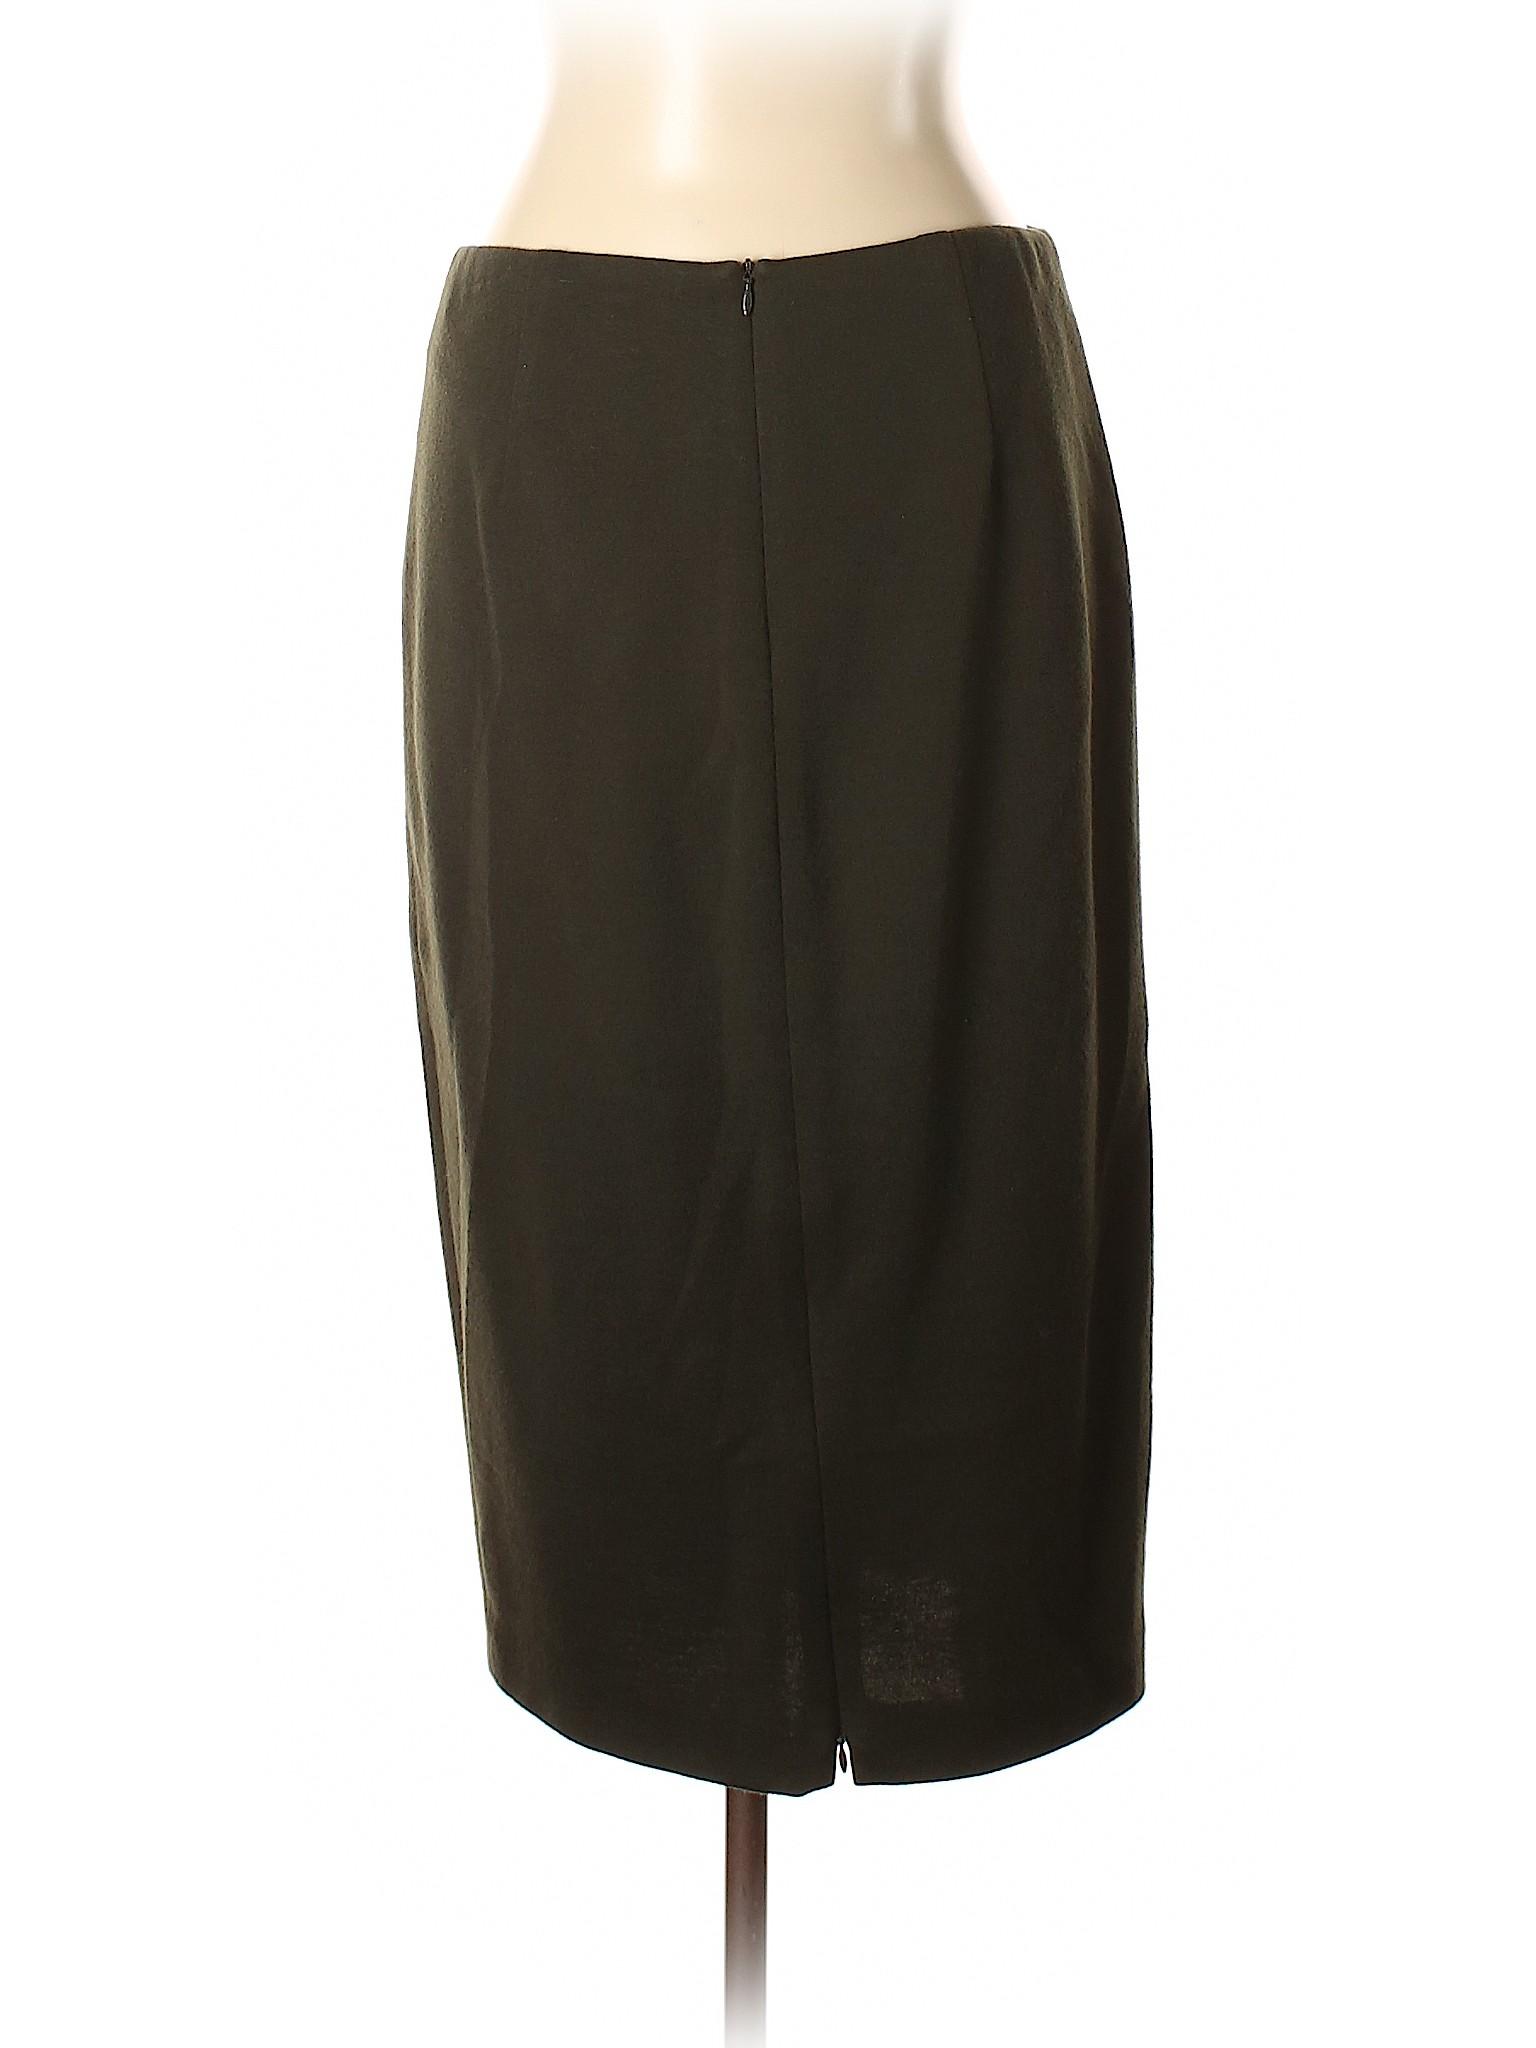 Casual Casual Boutique Skirt Casual Casual Boutique Skirt Boutique Casual Boutique Skirt Boutique Skirt Skirt Boutique gZqp0yOx